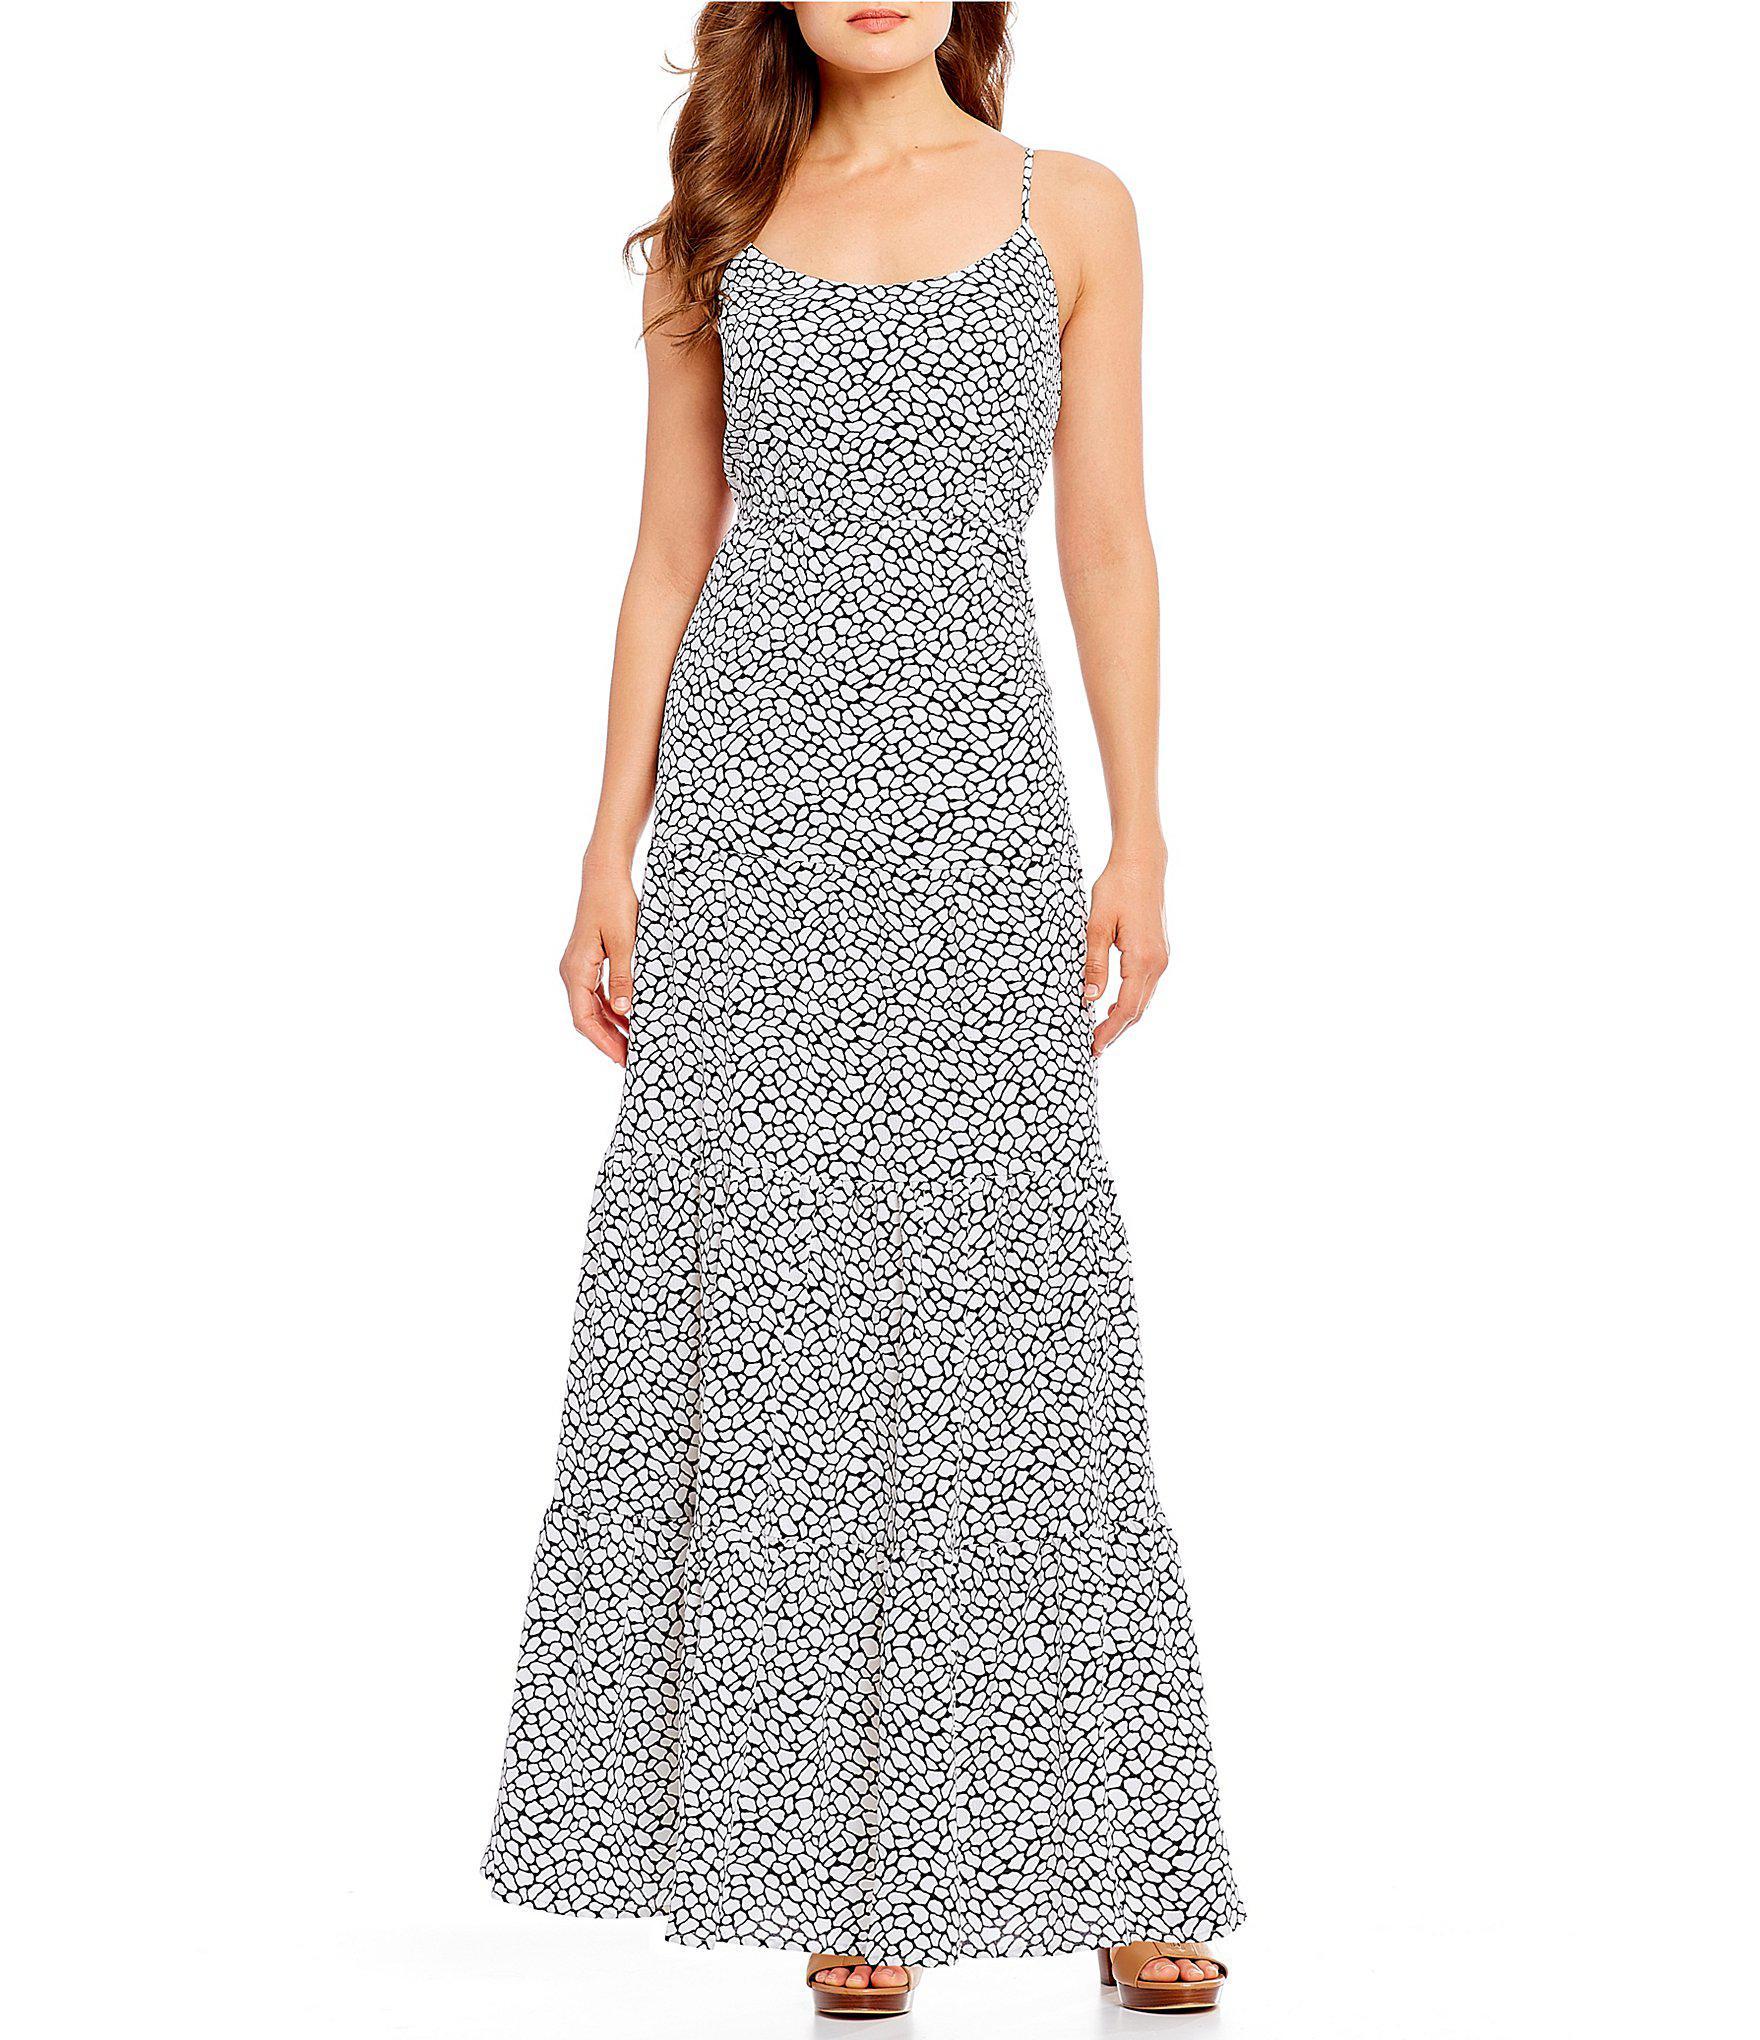 5e94670114d Lyst - MICHAEL Michael Kors Graphic Leopard Print Tiered Maxi Dress ...